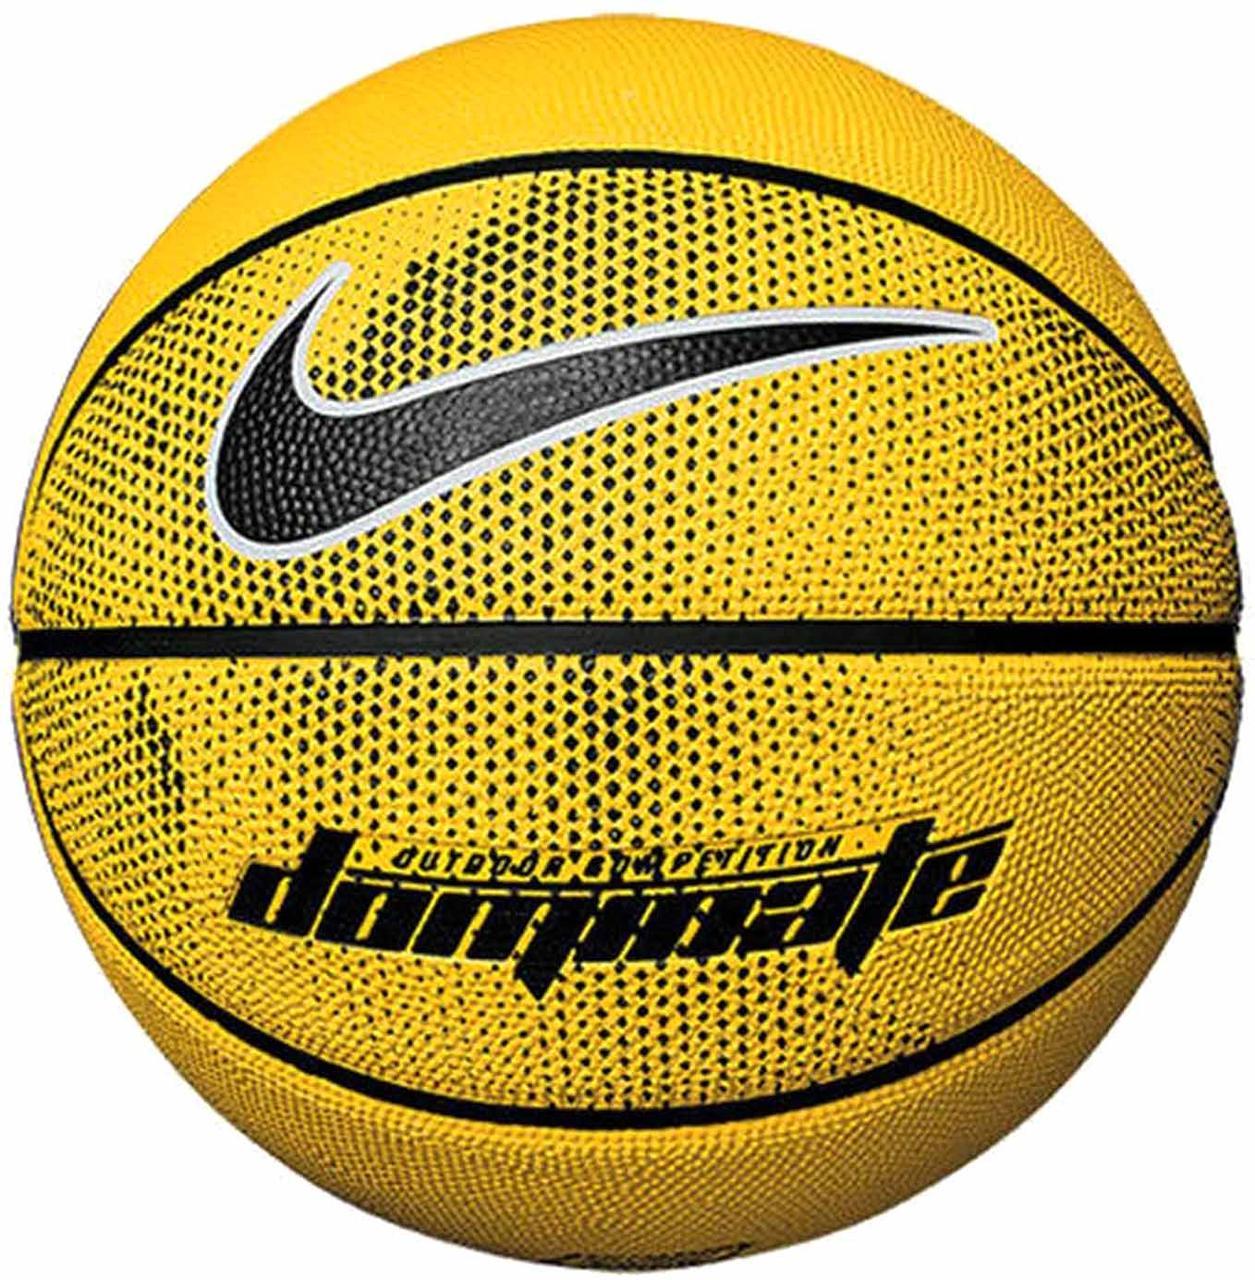 88f68235 Мяч баскетбольный Nike Dominate Size 7 (N.KI.00.940.07): продажа ...